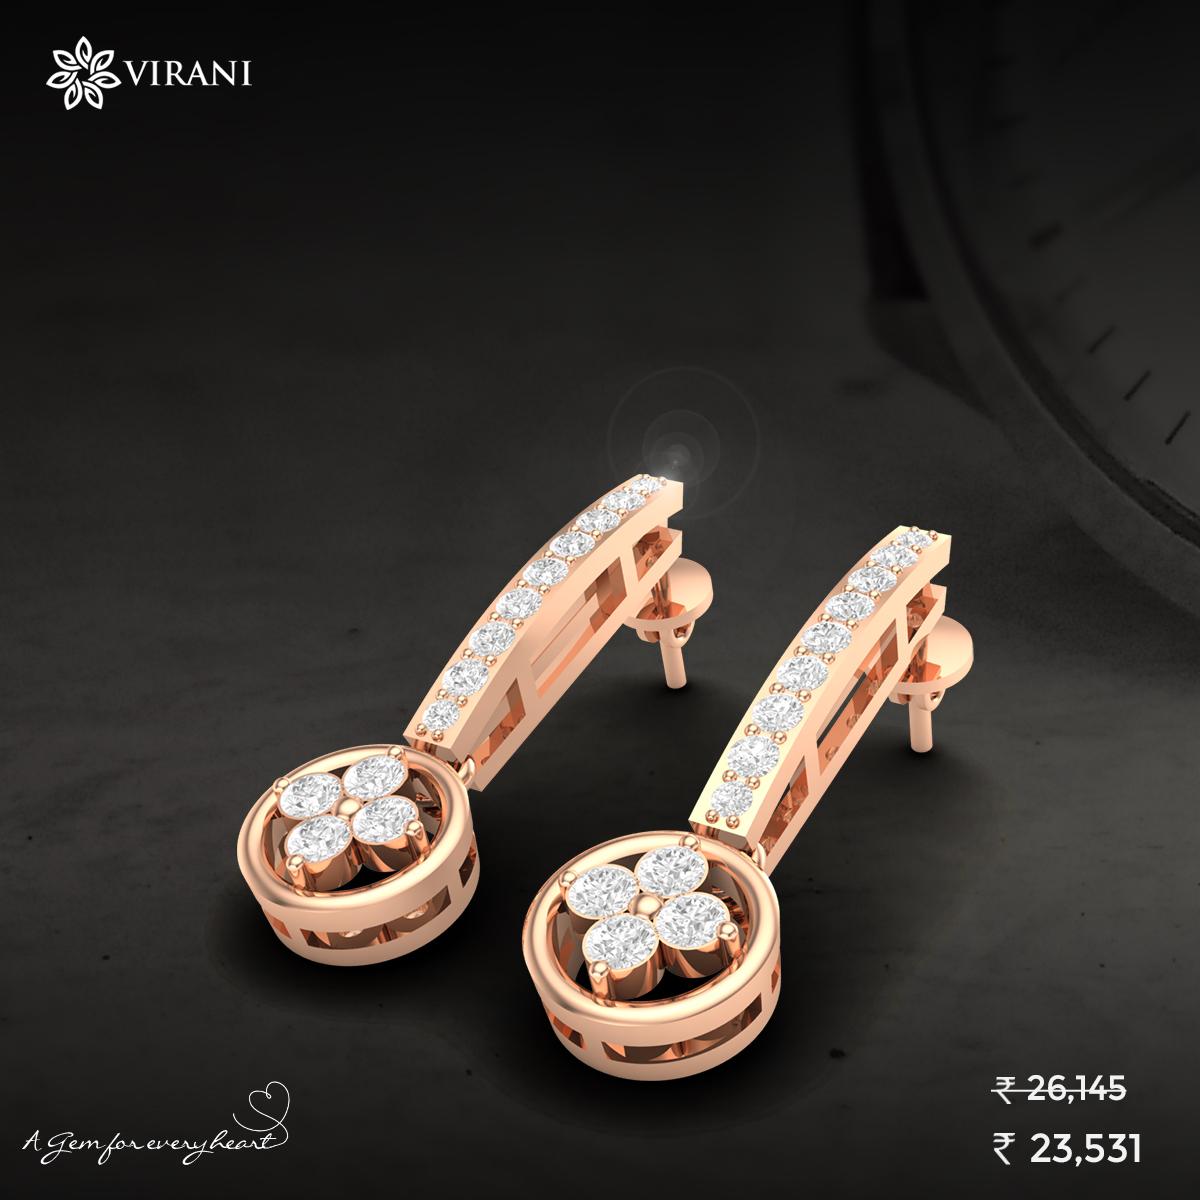 Viranigems Diamond Jewellery Online